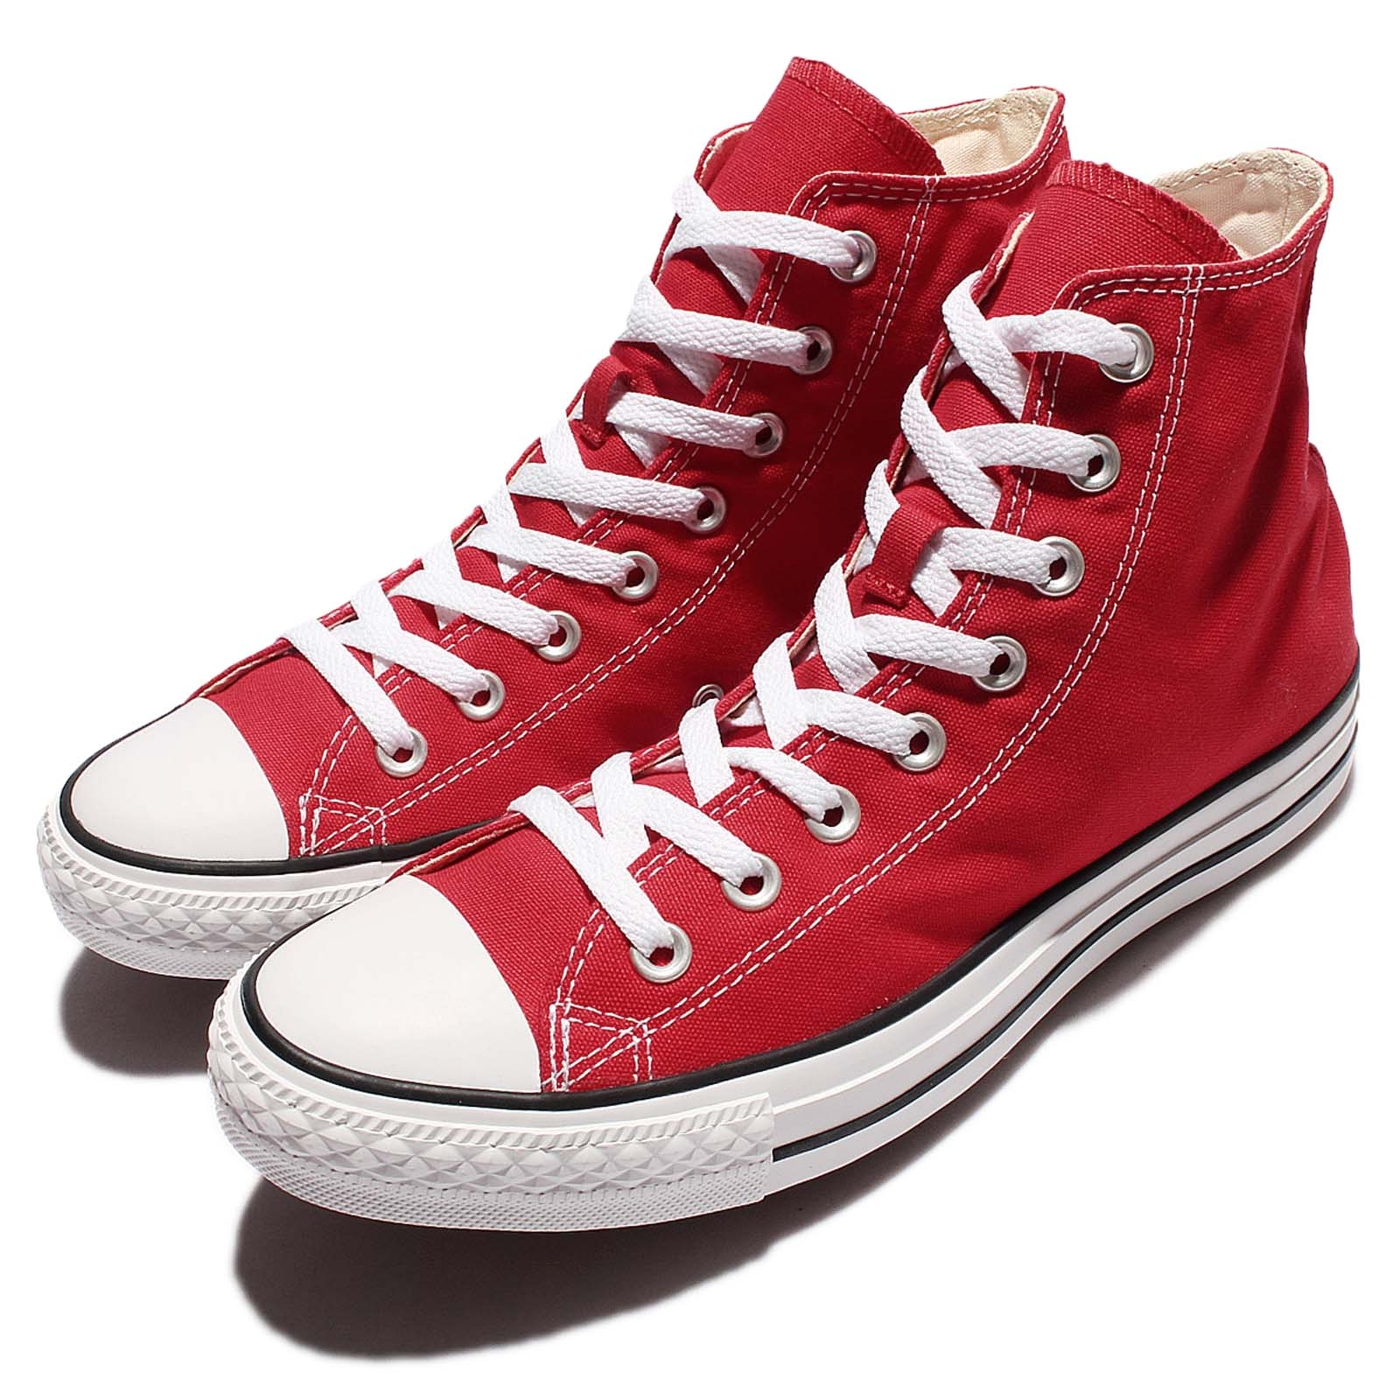 Converse Chuck Taylor All Star紅白基本款帆布鞋男鞋女鞋PUMP306 M9621C